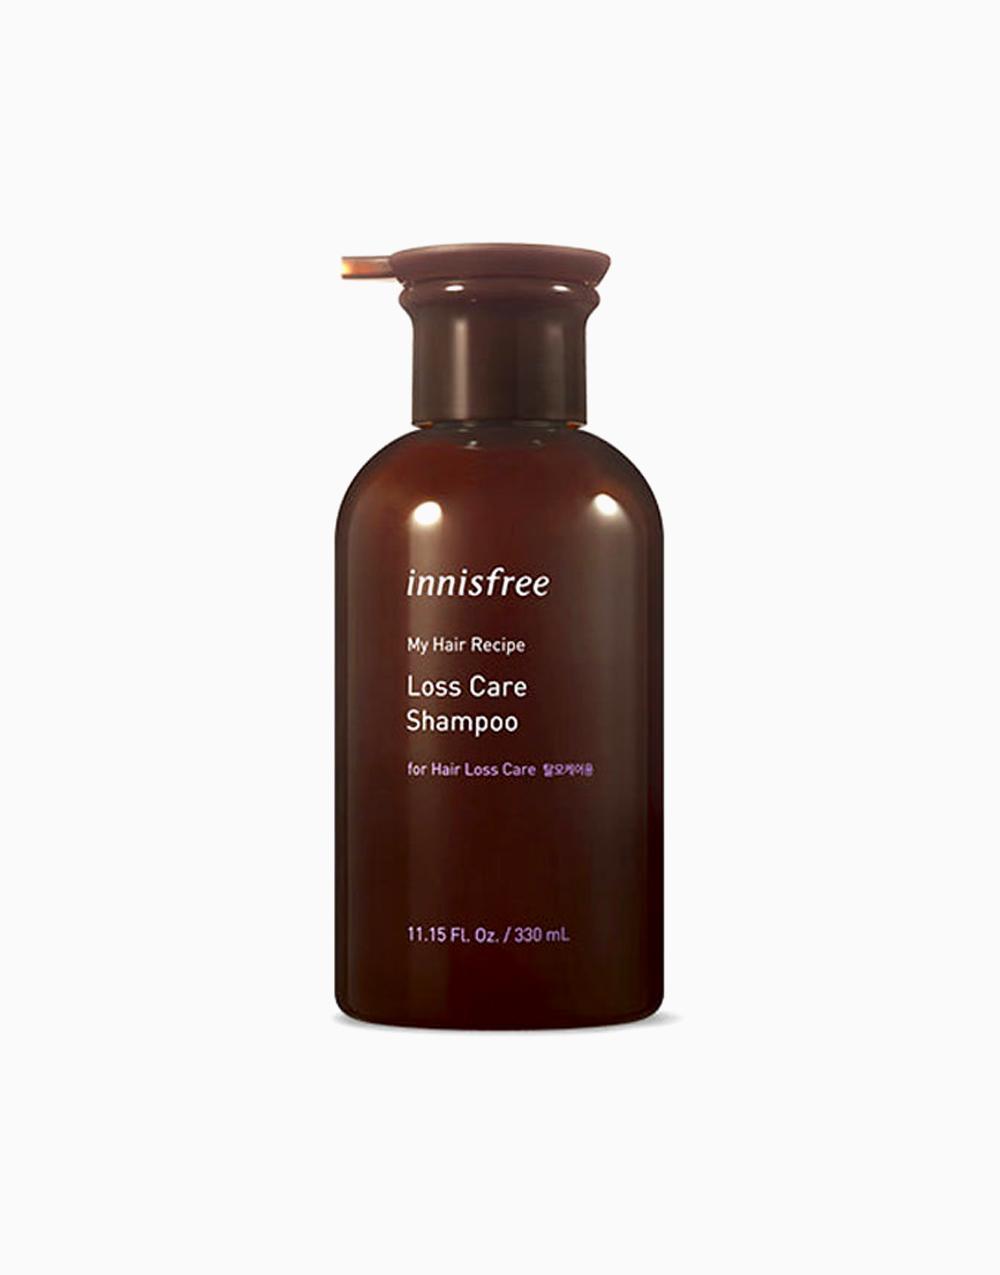 My Hair Recipe Loss Care Shampoo by Innisfree